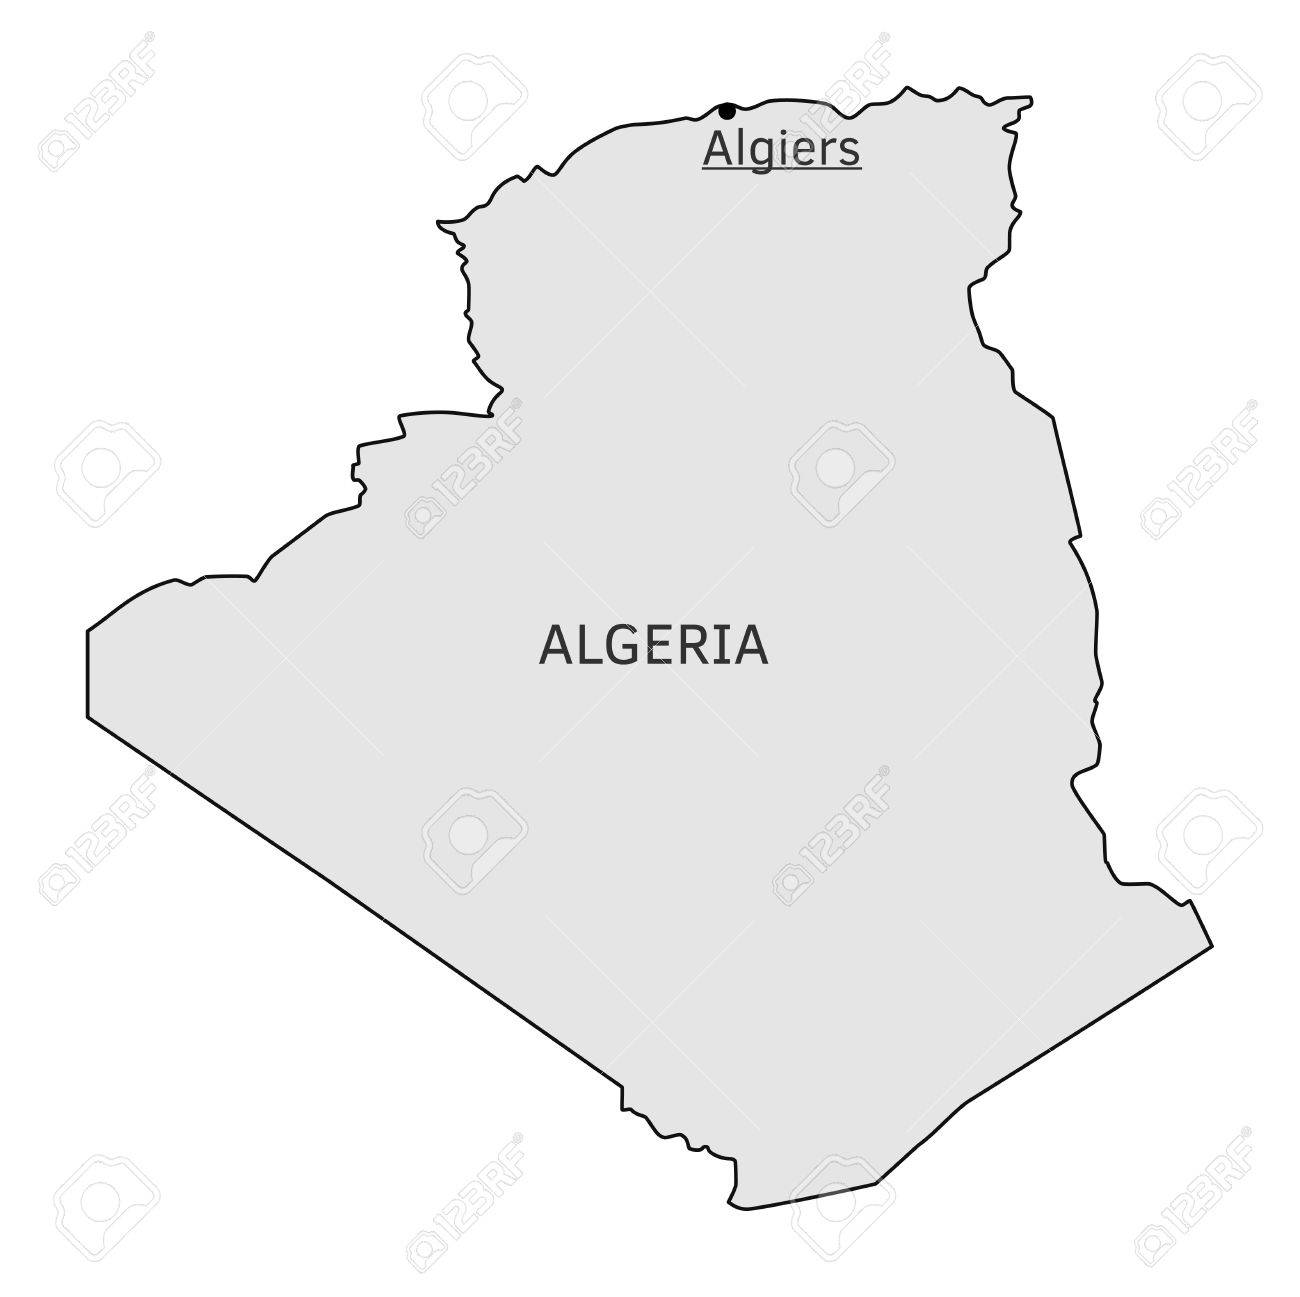 Carte Algeria Vector.Algeria Silhouette Map With Algiers Capital